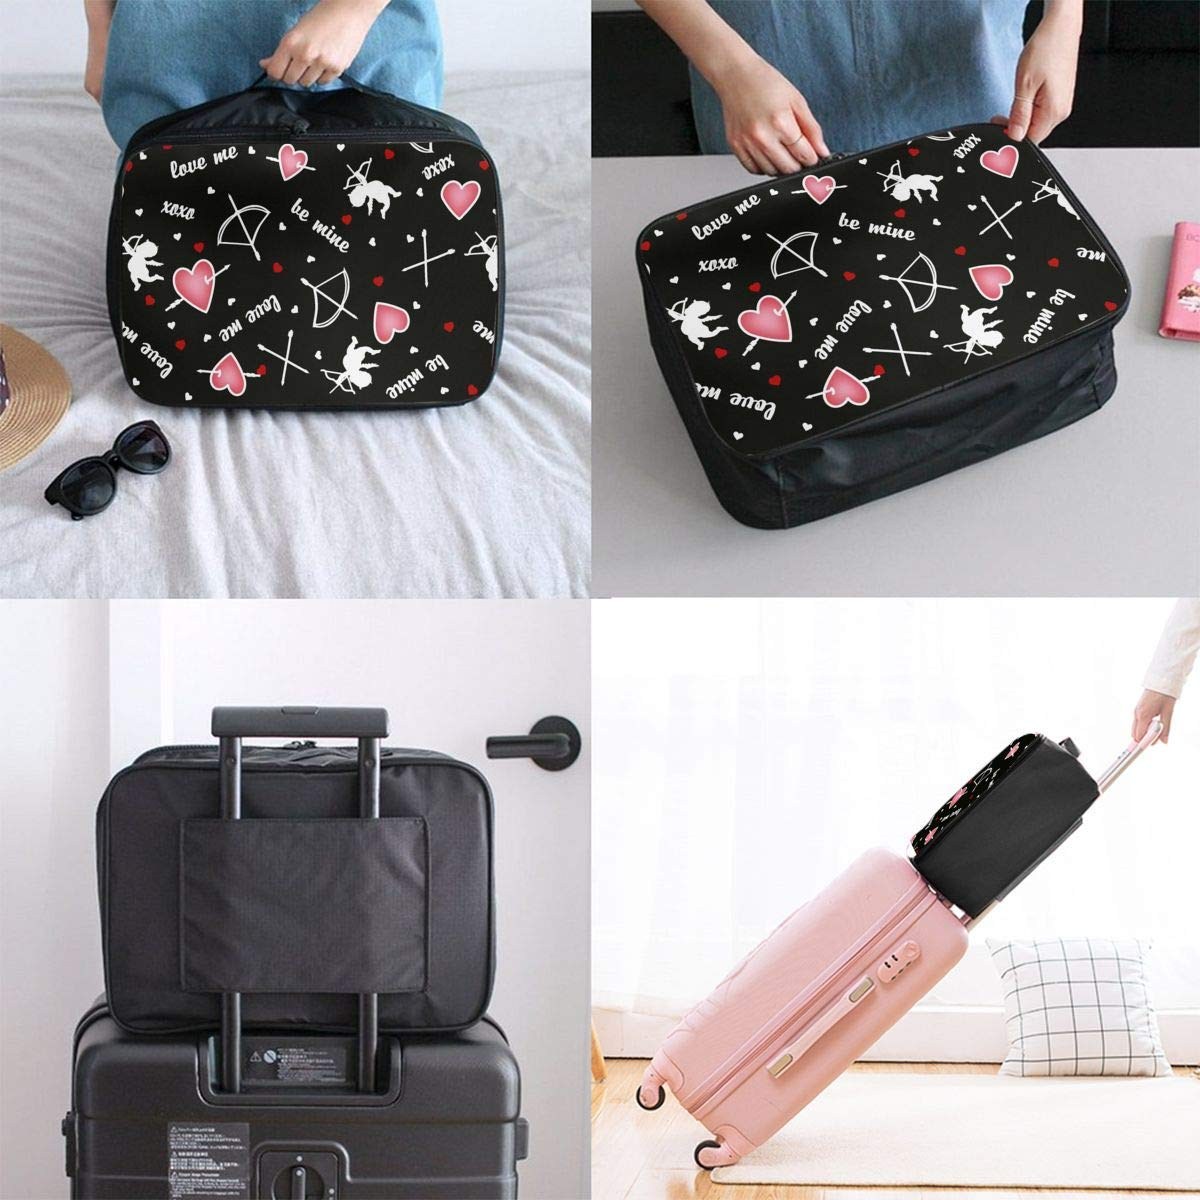 JTRVW Luggage Bags for Travel Foldable Travel Bag Travel Duffle Bag Lightweight Waterproof Travel Luggage Bag Cupid Angel Pink Love Heart Arrow Black